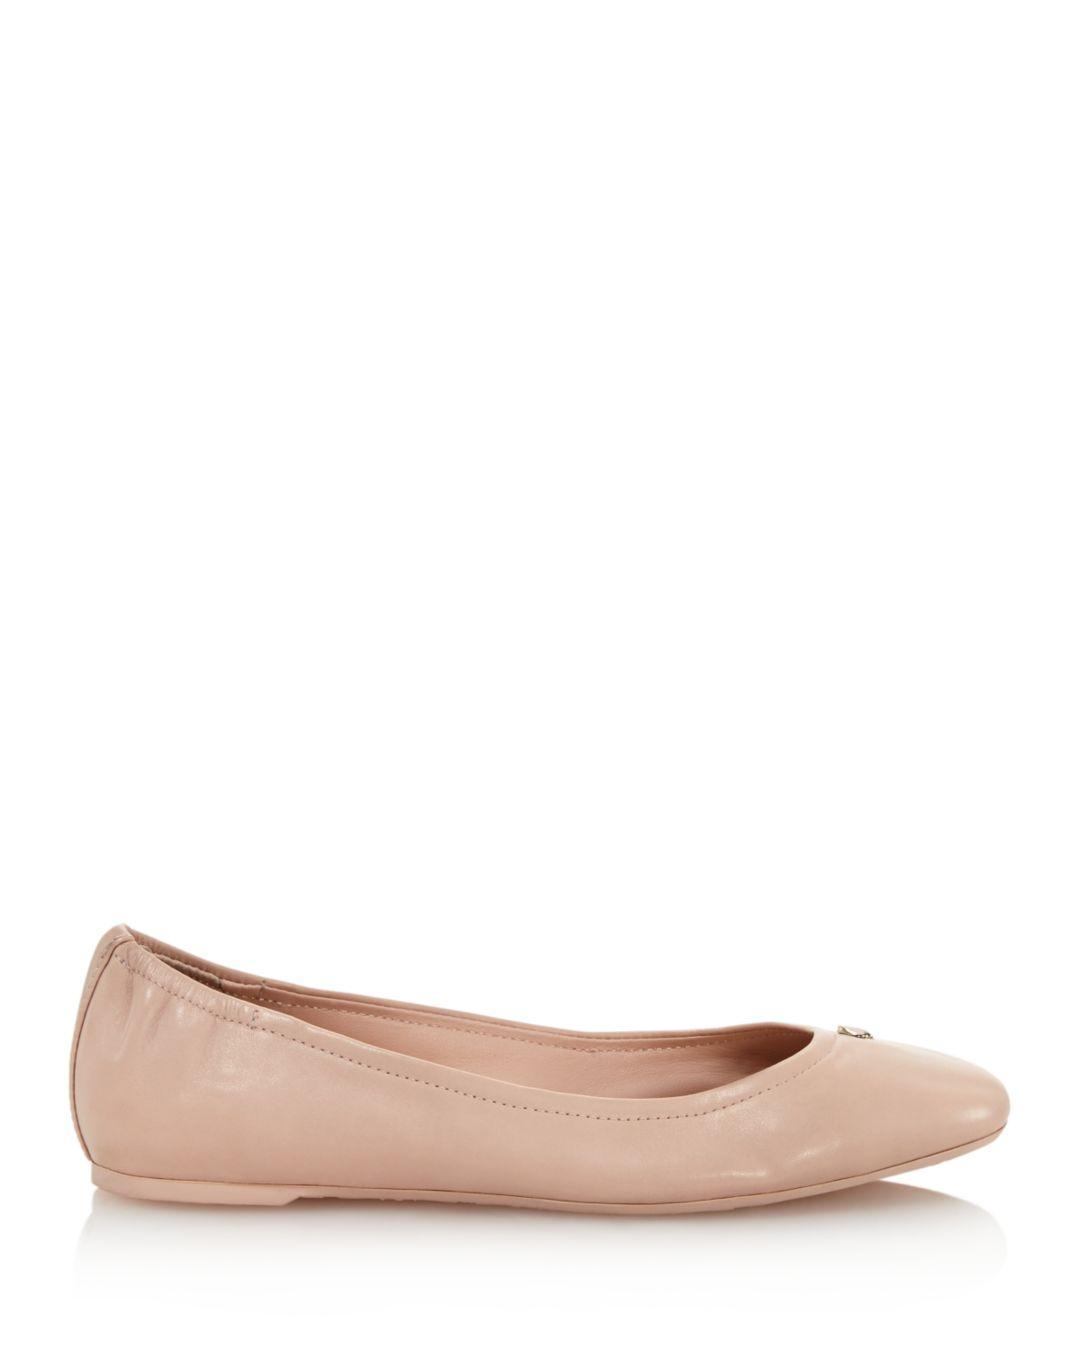 657f283034a7 Kate Spade - Multicolor Kora Ballet Flats - Lyst. View fullscreen